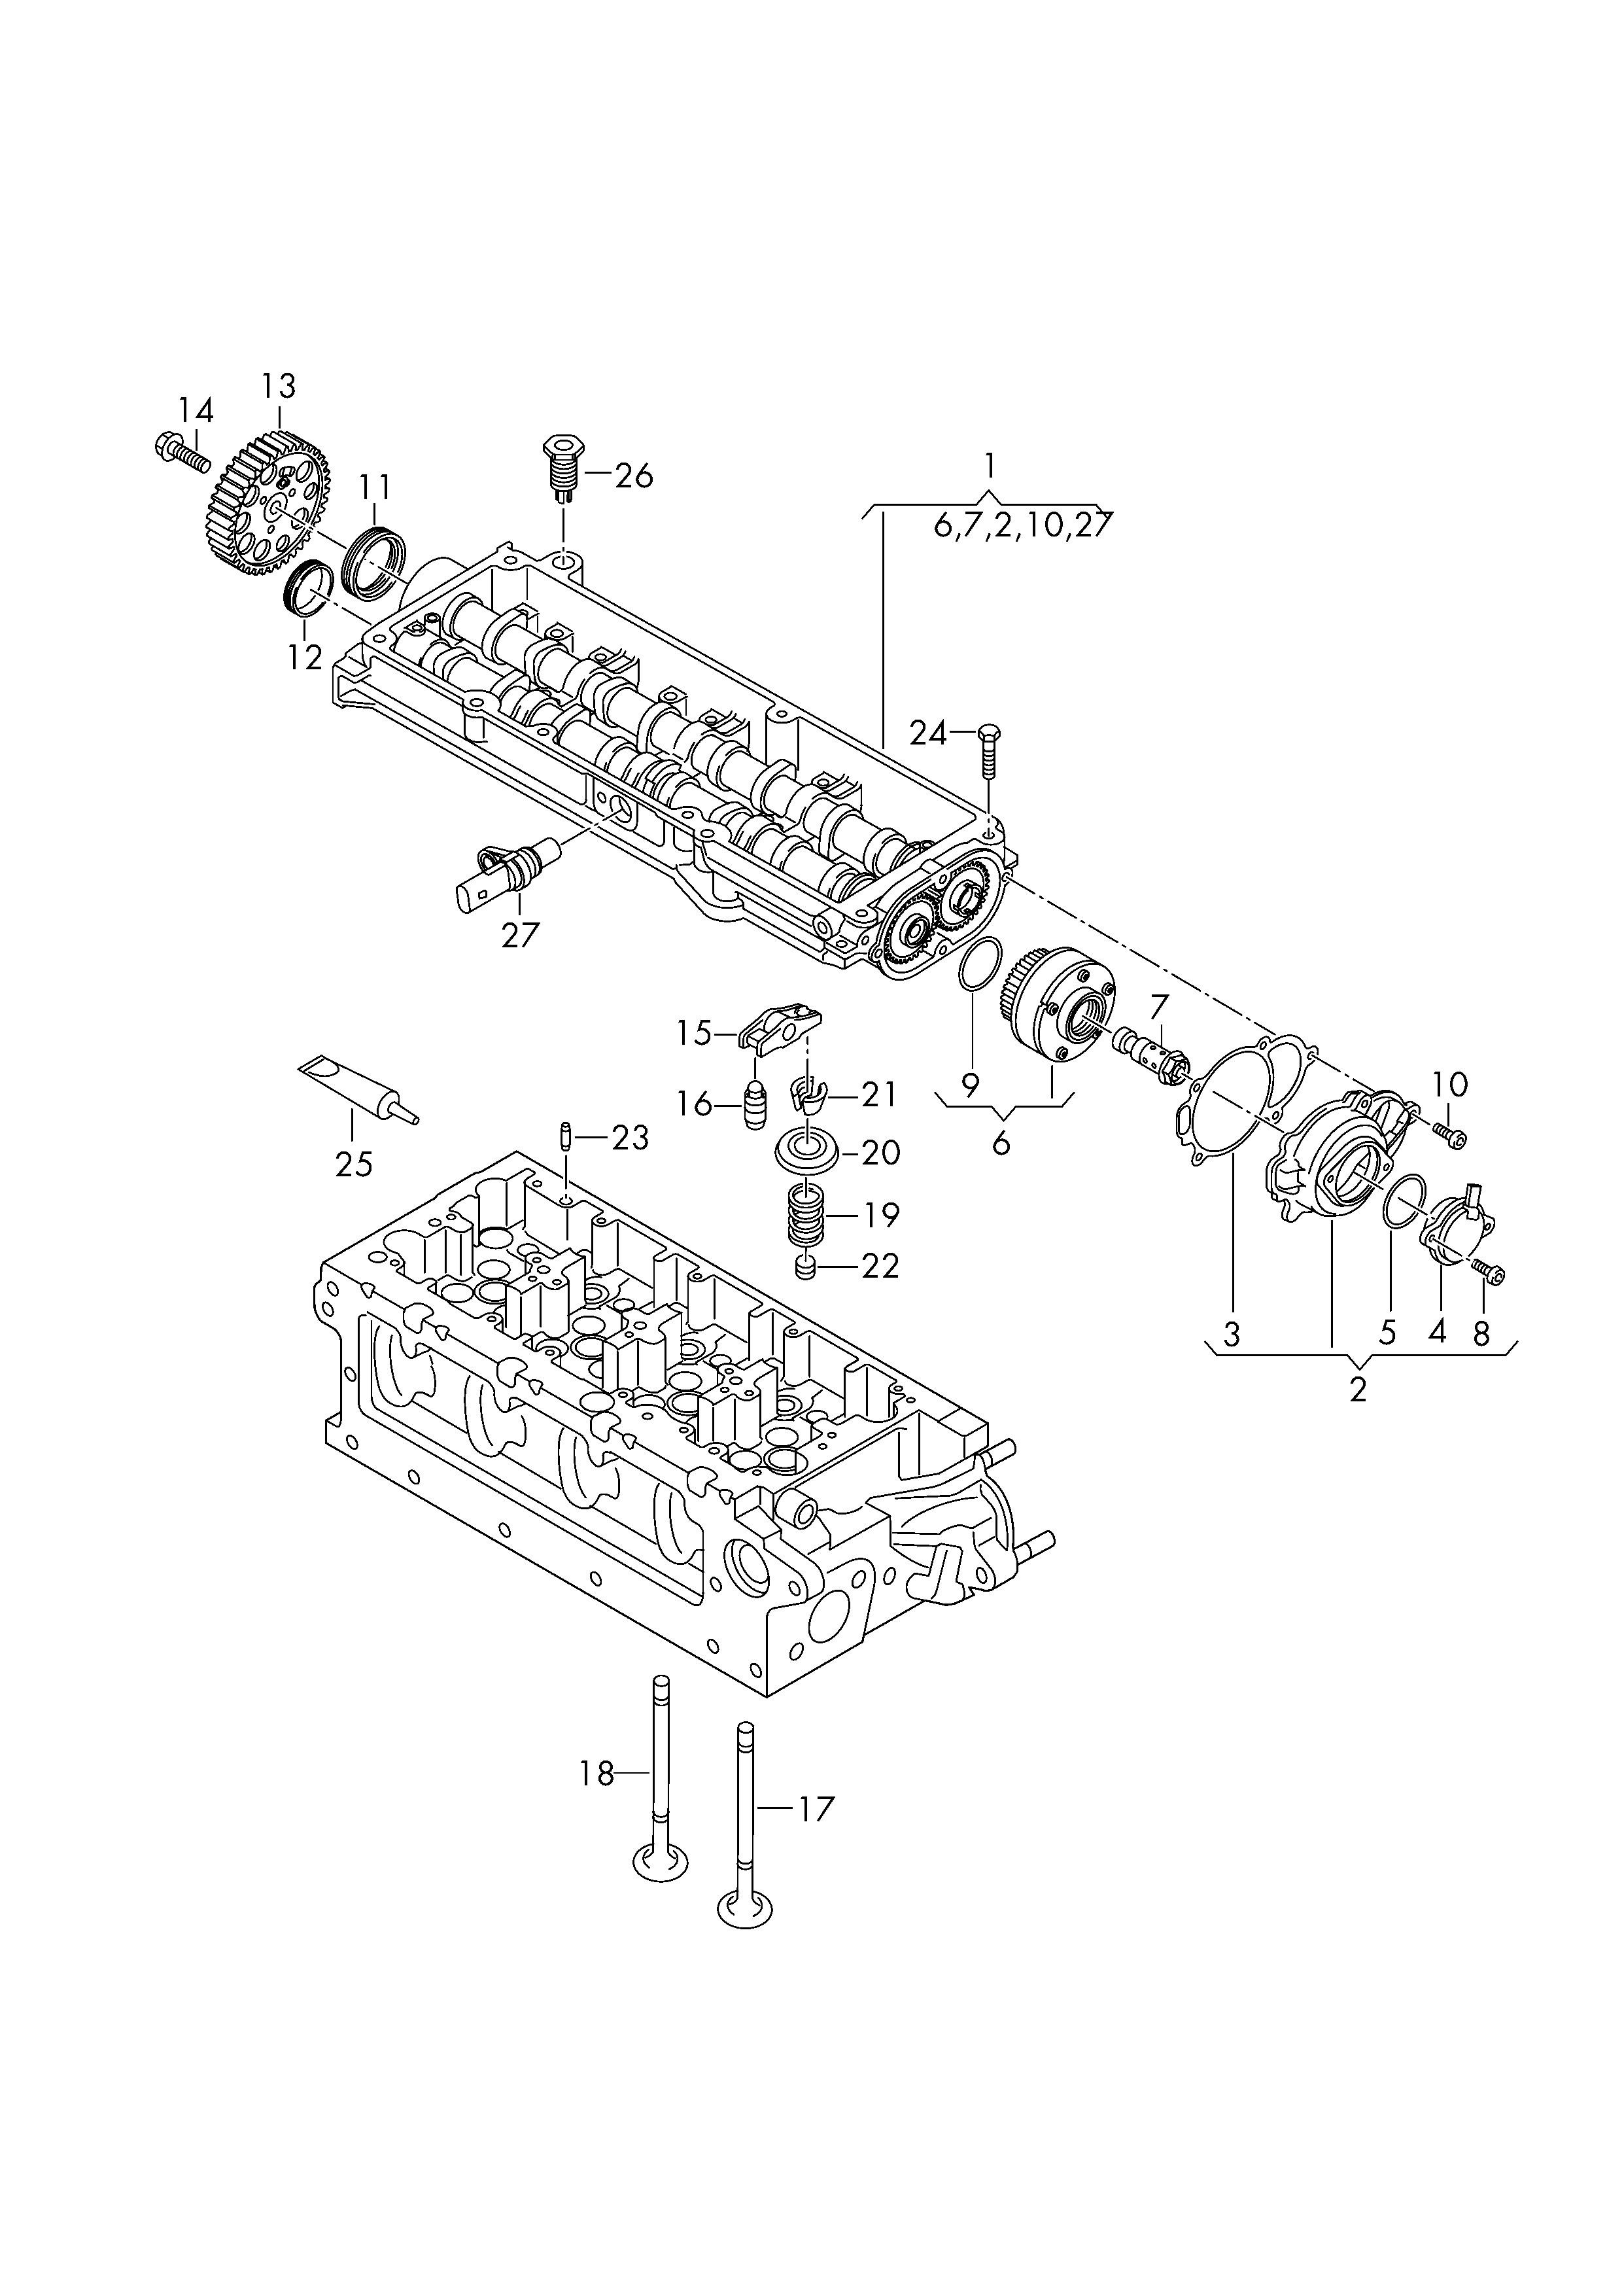 0B5B68 Vw Pat Engine Part Diagram | Wiring Resources on jeep 3.6 engine, audi 3.6 engine, saturn 3.6 engine,